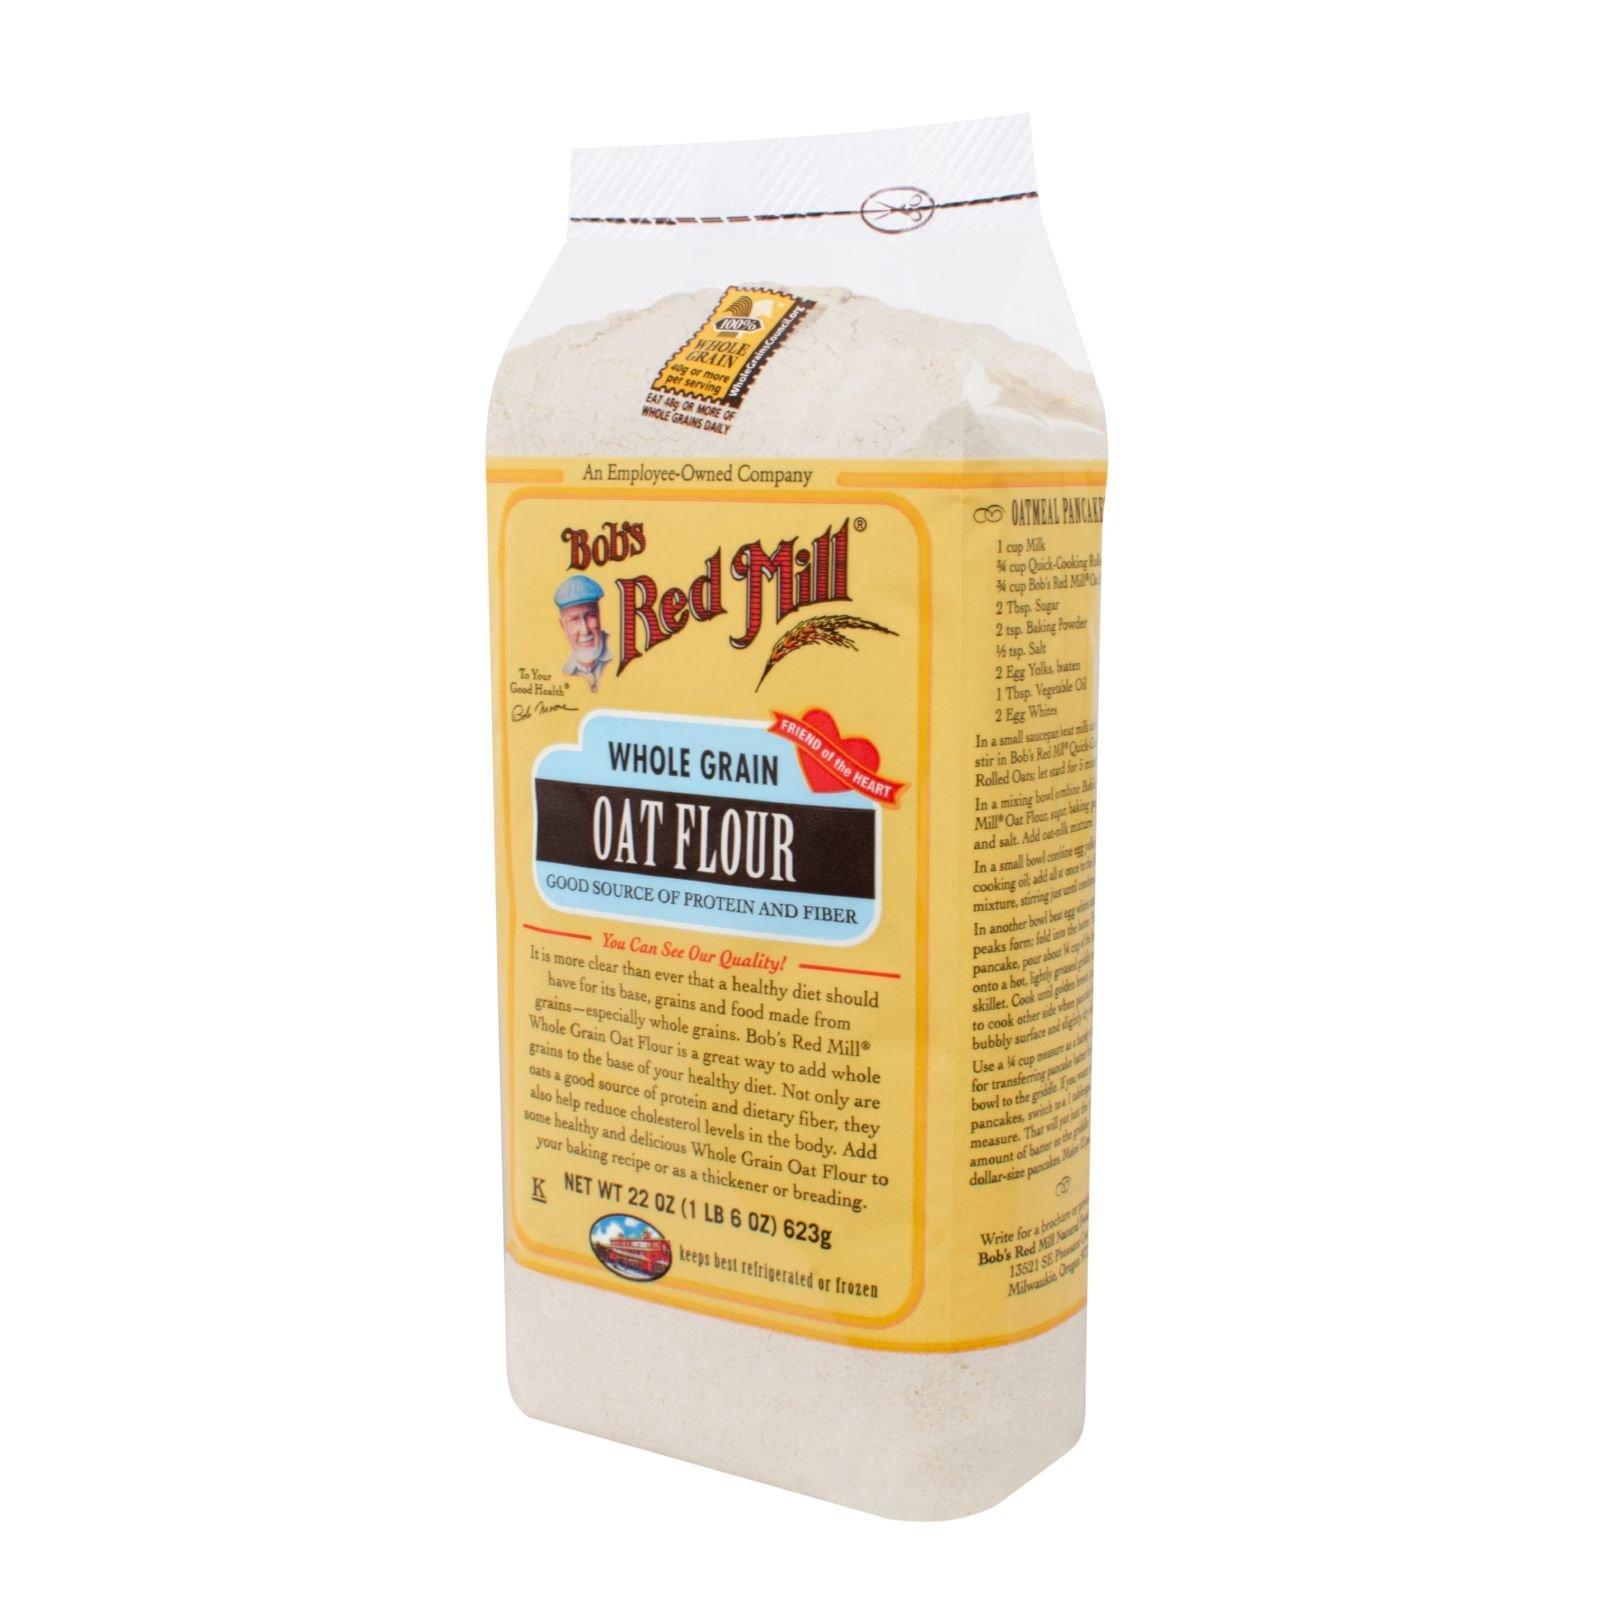 Bob's Red Mill Whole Grain Oat Flour - 22 oz - Case of 4